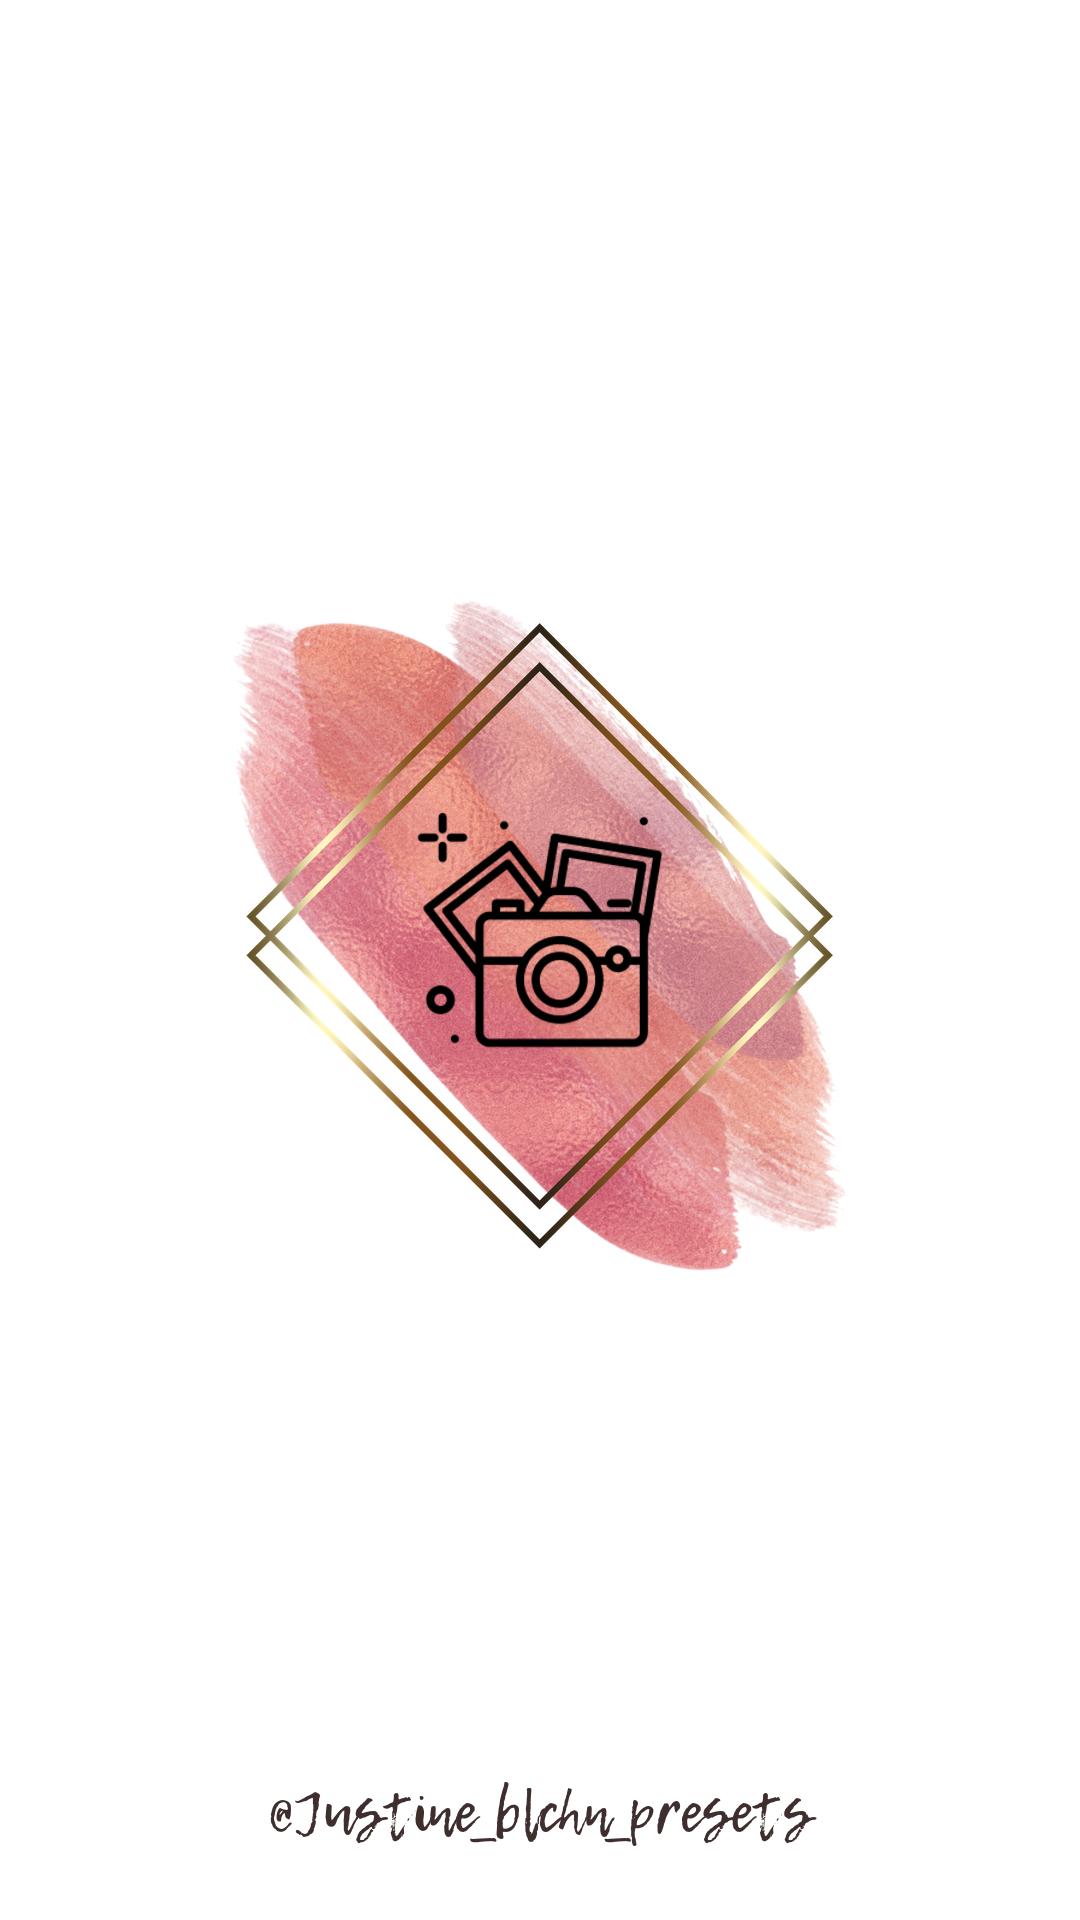 Aesthetic Snapchat Logo Black